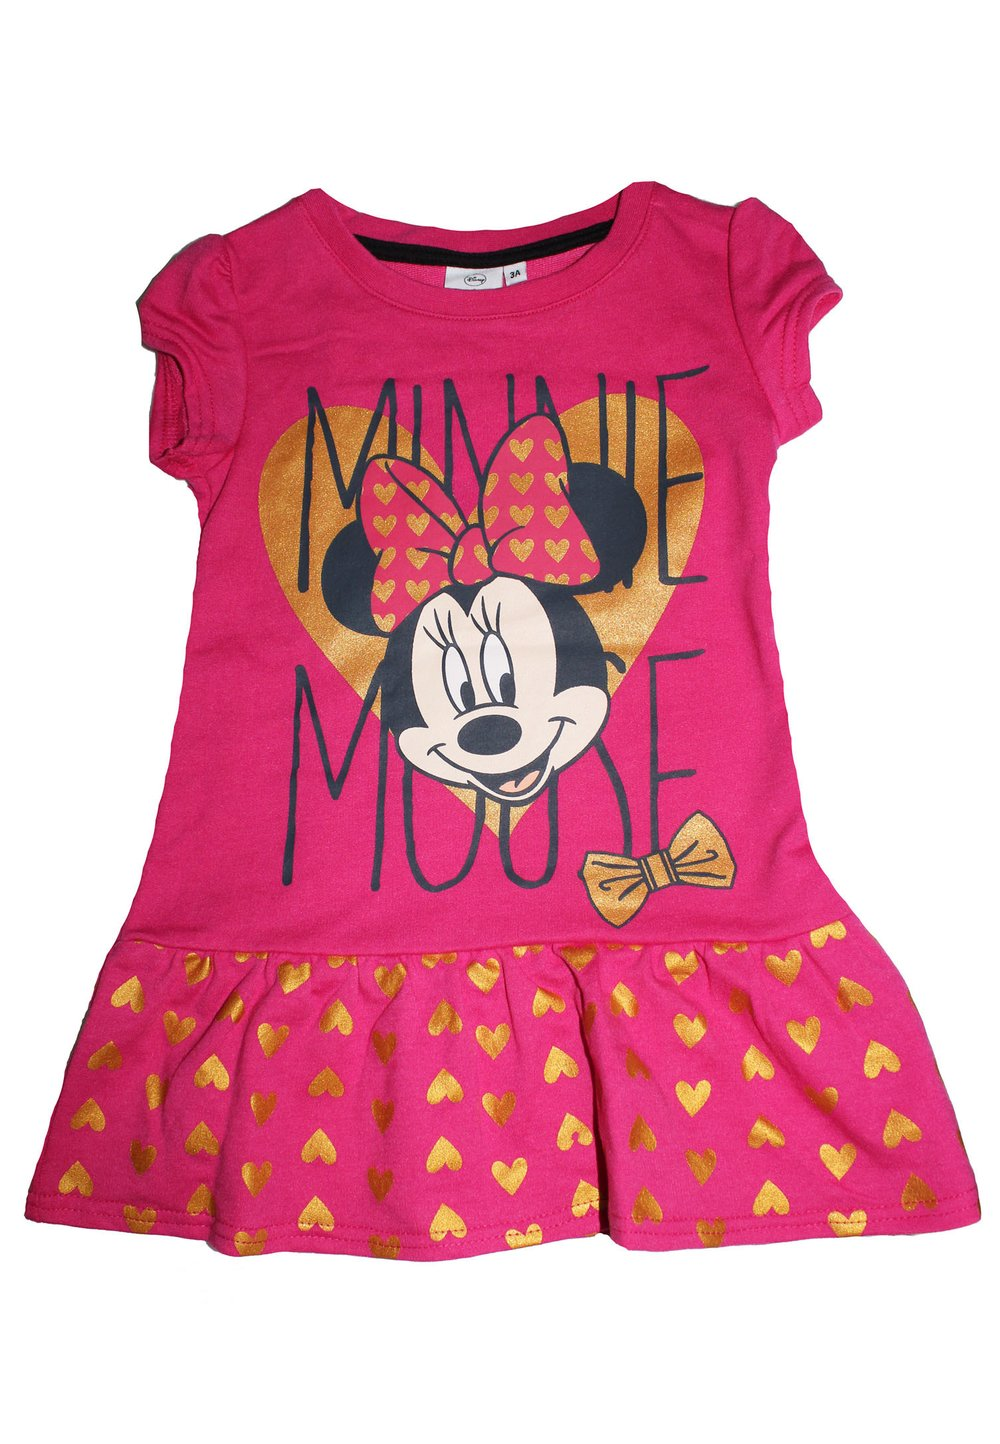 Rochie Minnie Mouse, roz cu inimioare imagine